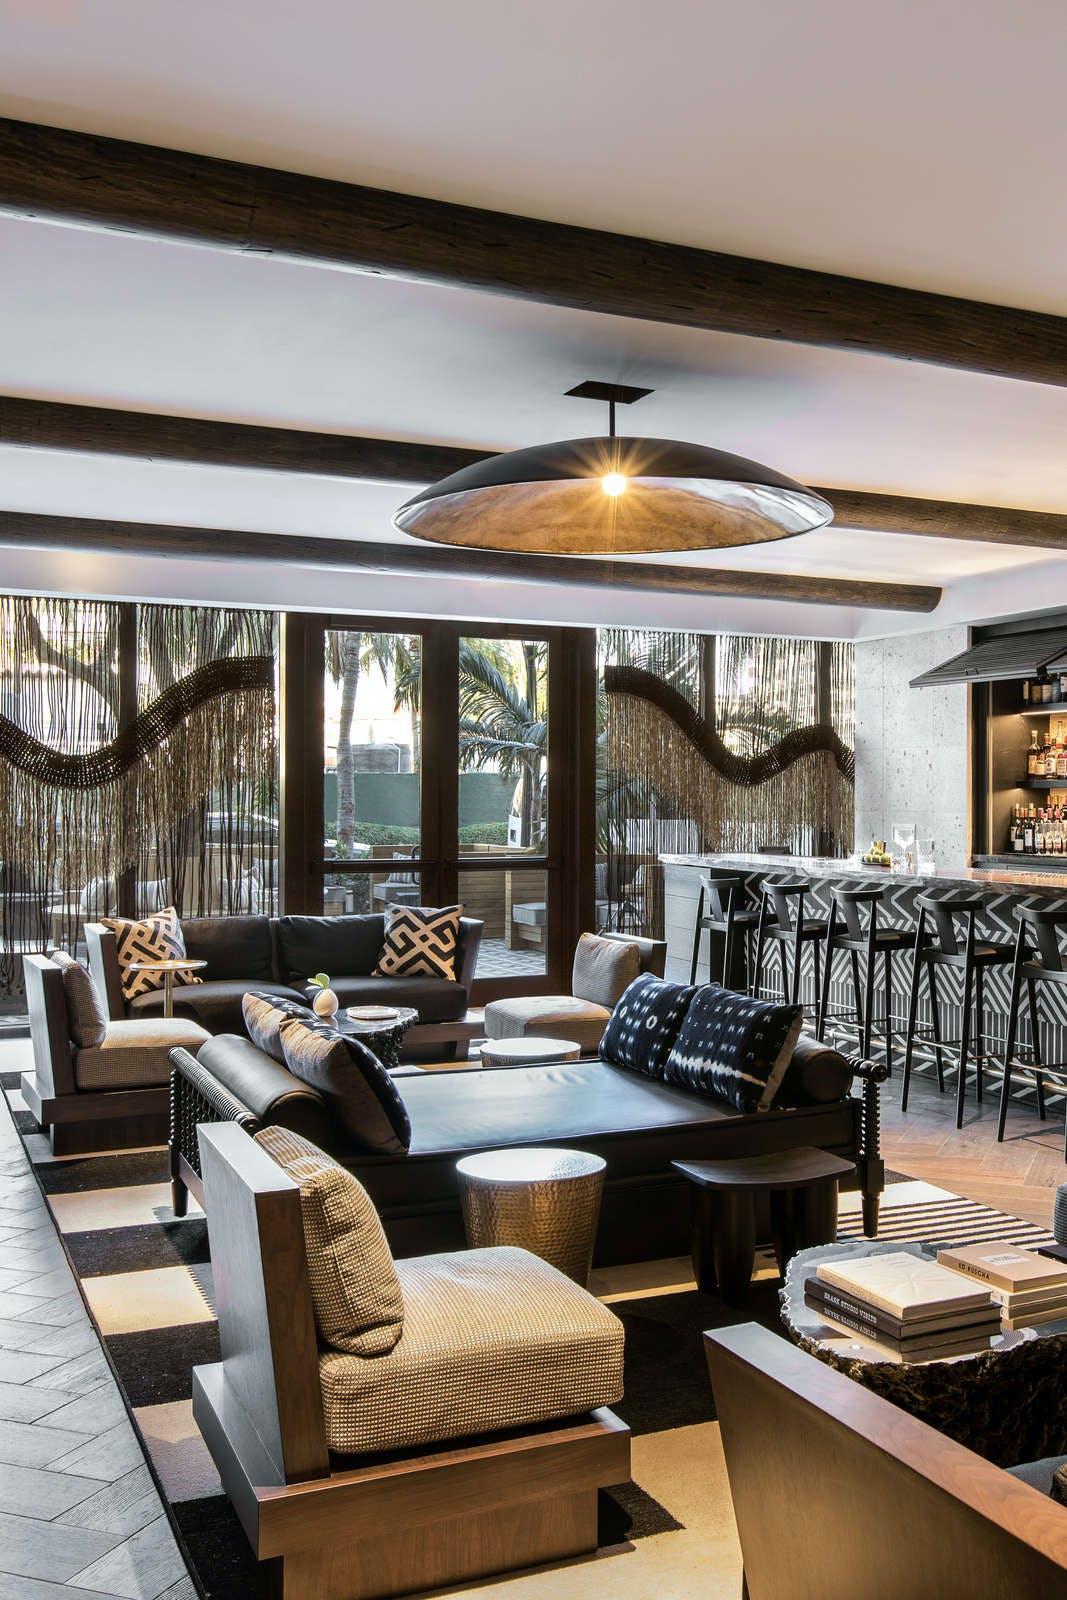 Kimpton Angler's Hotel South Beach